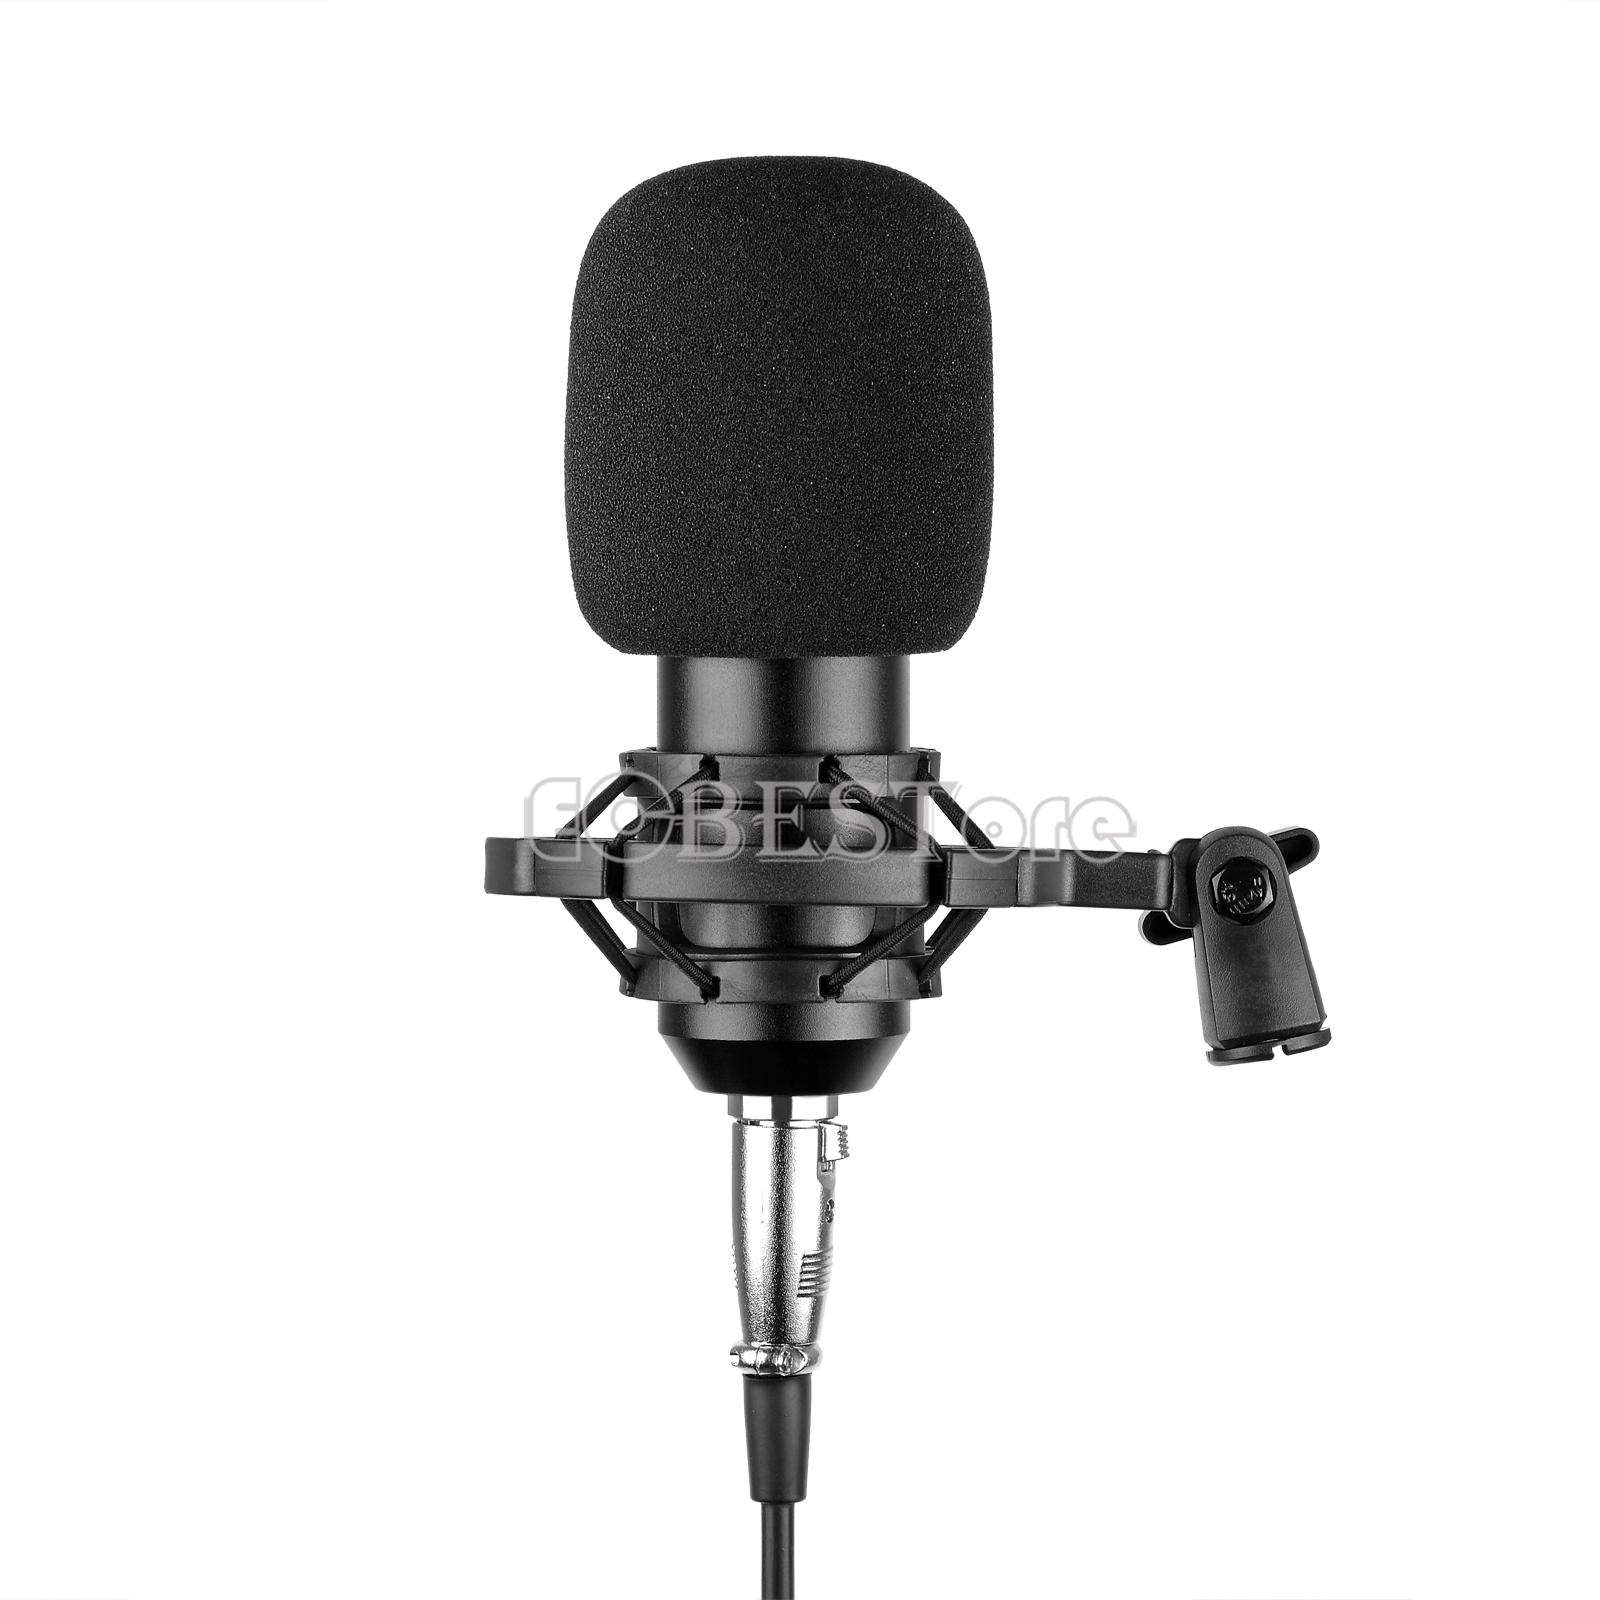 Studio Condenser Microphone Cardioid PC Computer Recording ...